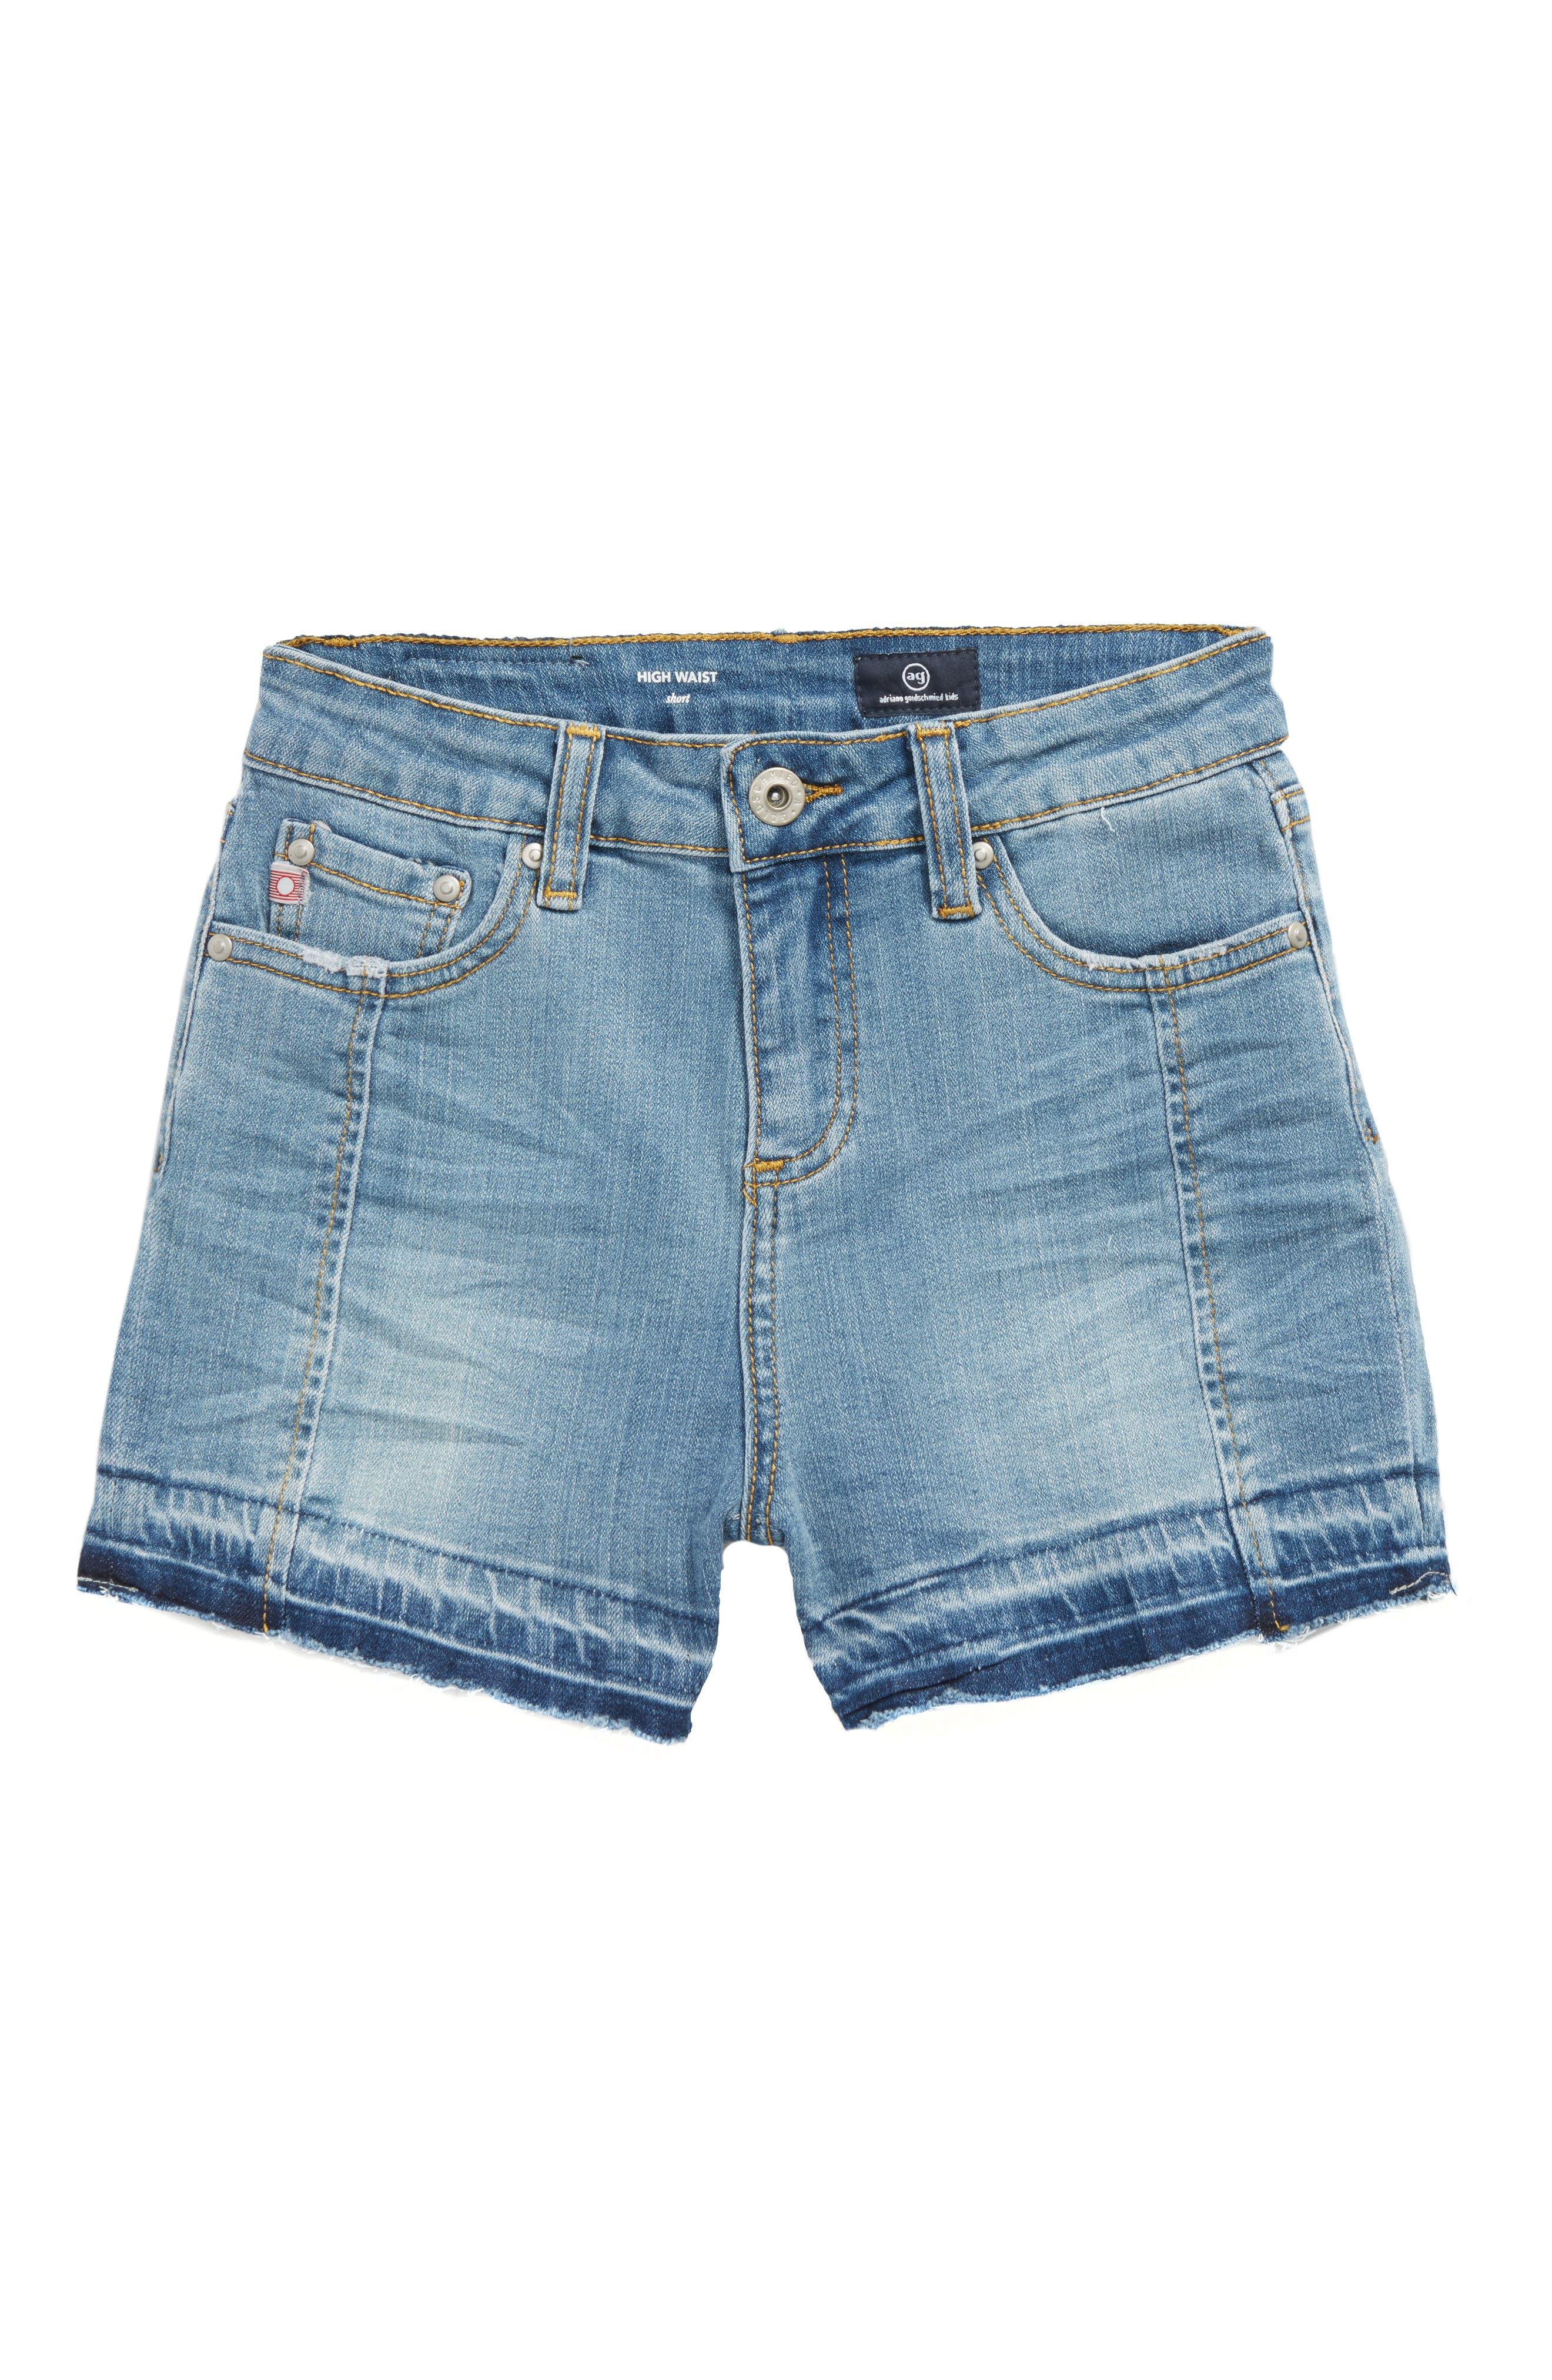 ag adriano goldschmied kids Released Hem High Waist Shorts (Big Girls)